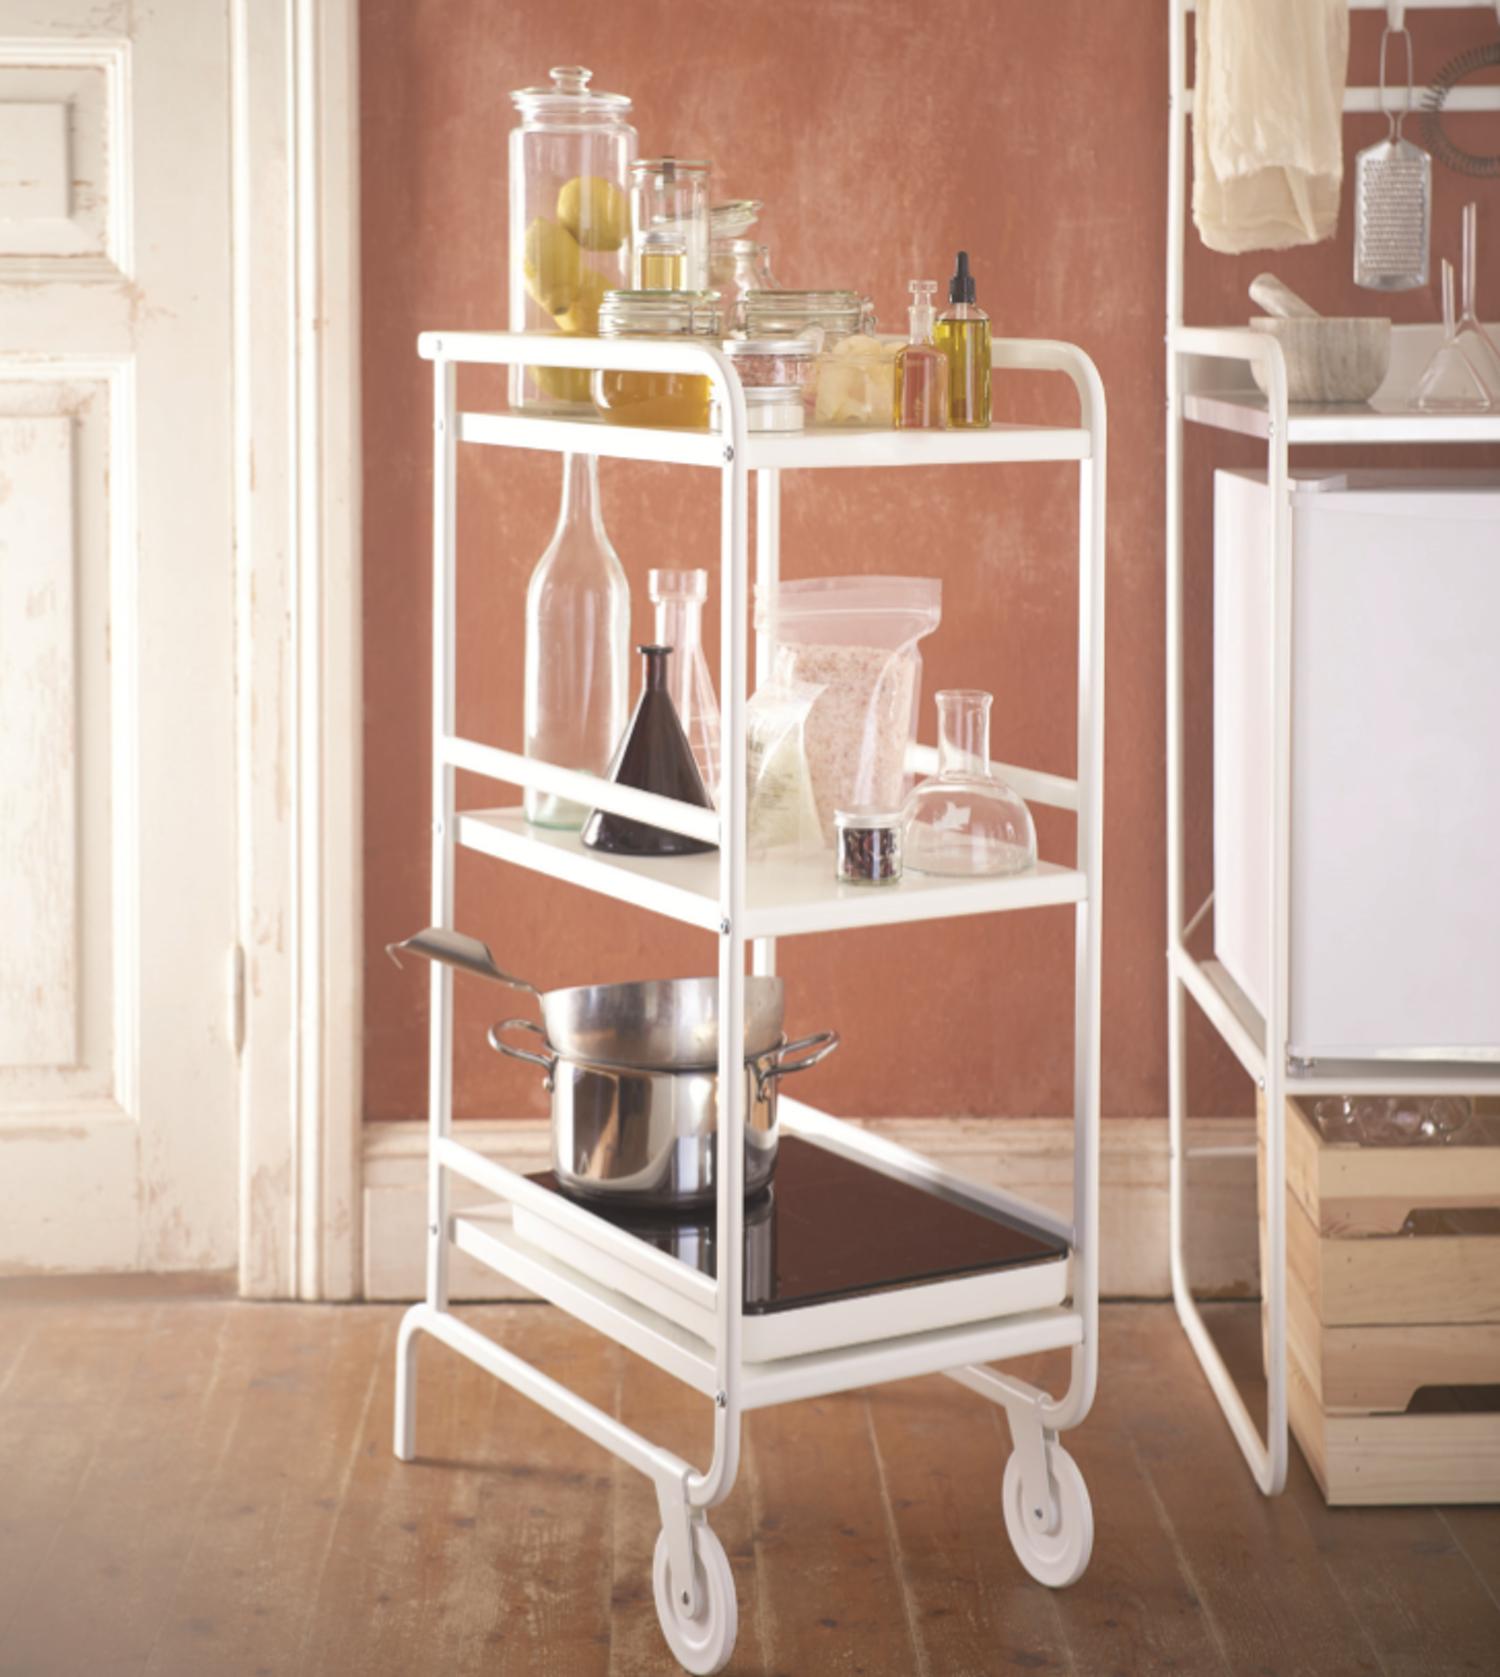 7 SUNNERSTA Cart & Mini Kitchen (With images) Ikea bar